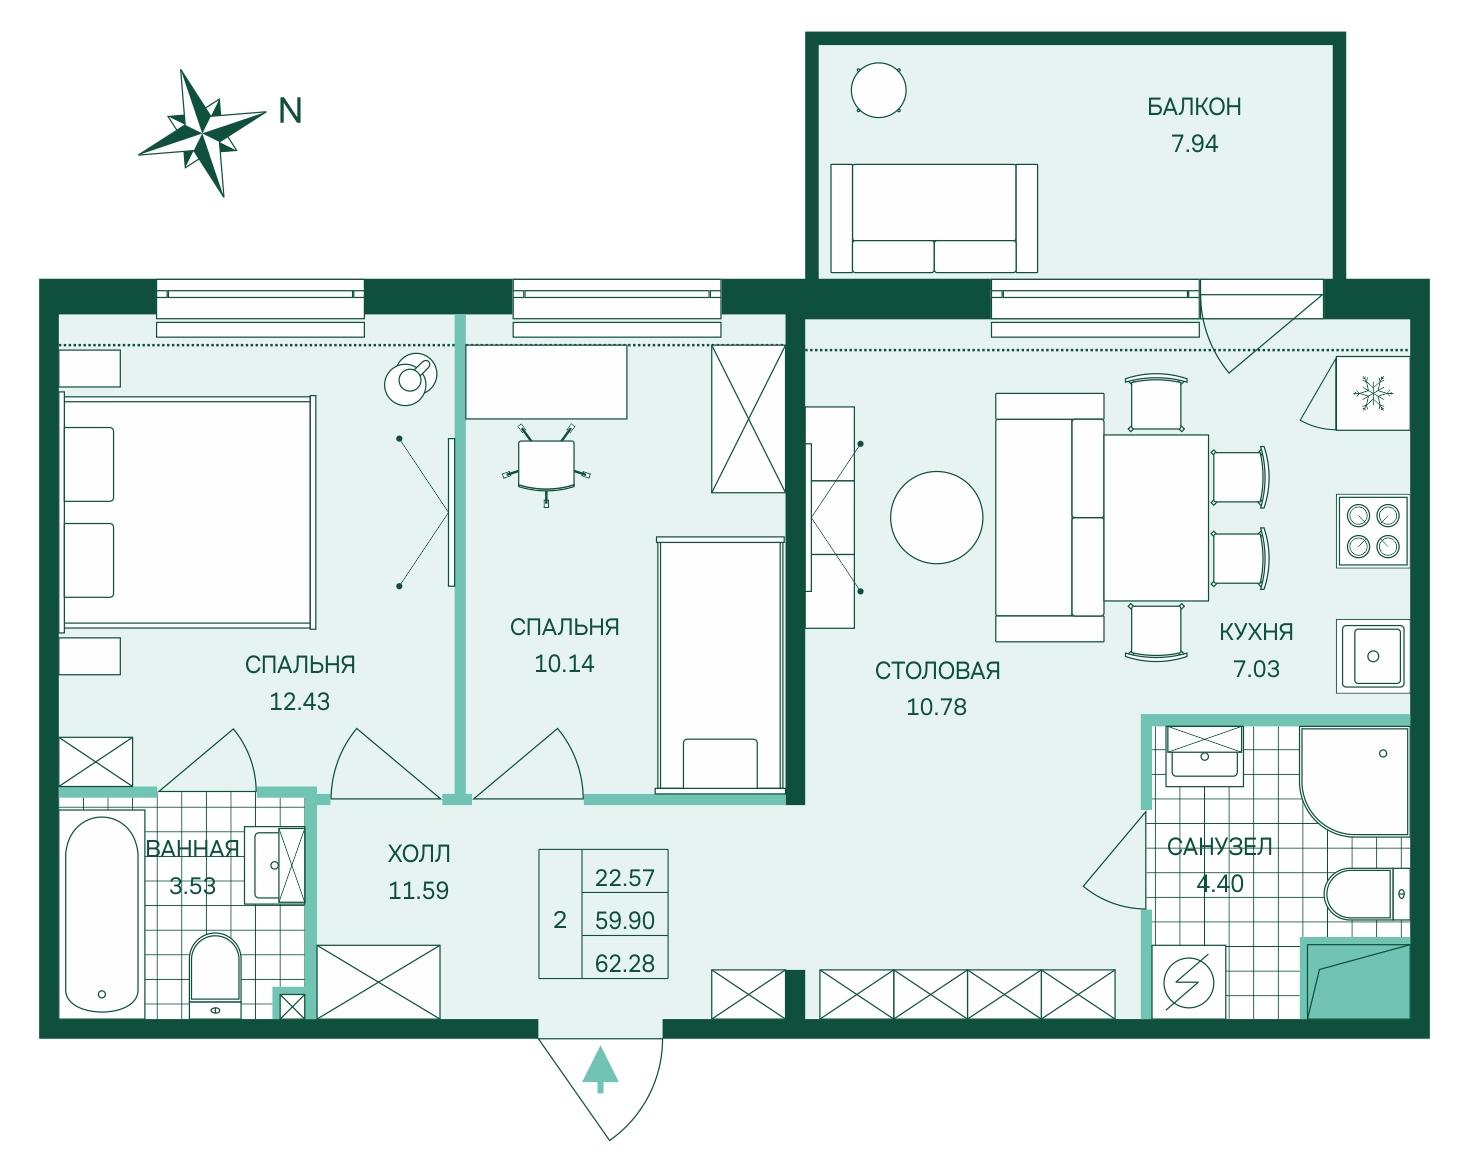 Планировка Трёхкомнатная квартира (Евро) площадью 62.28 кв.м в ЖК «Skandi Klubb»